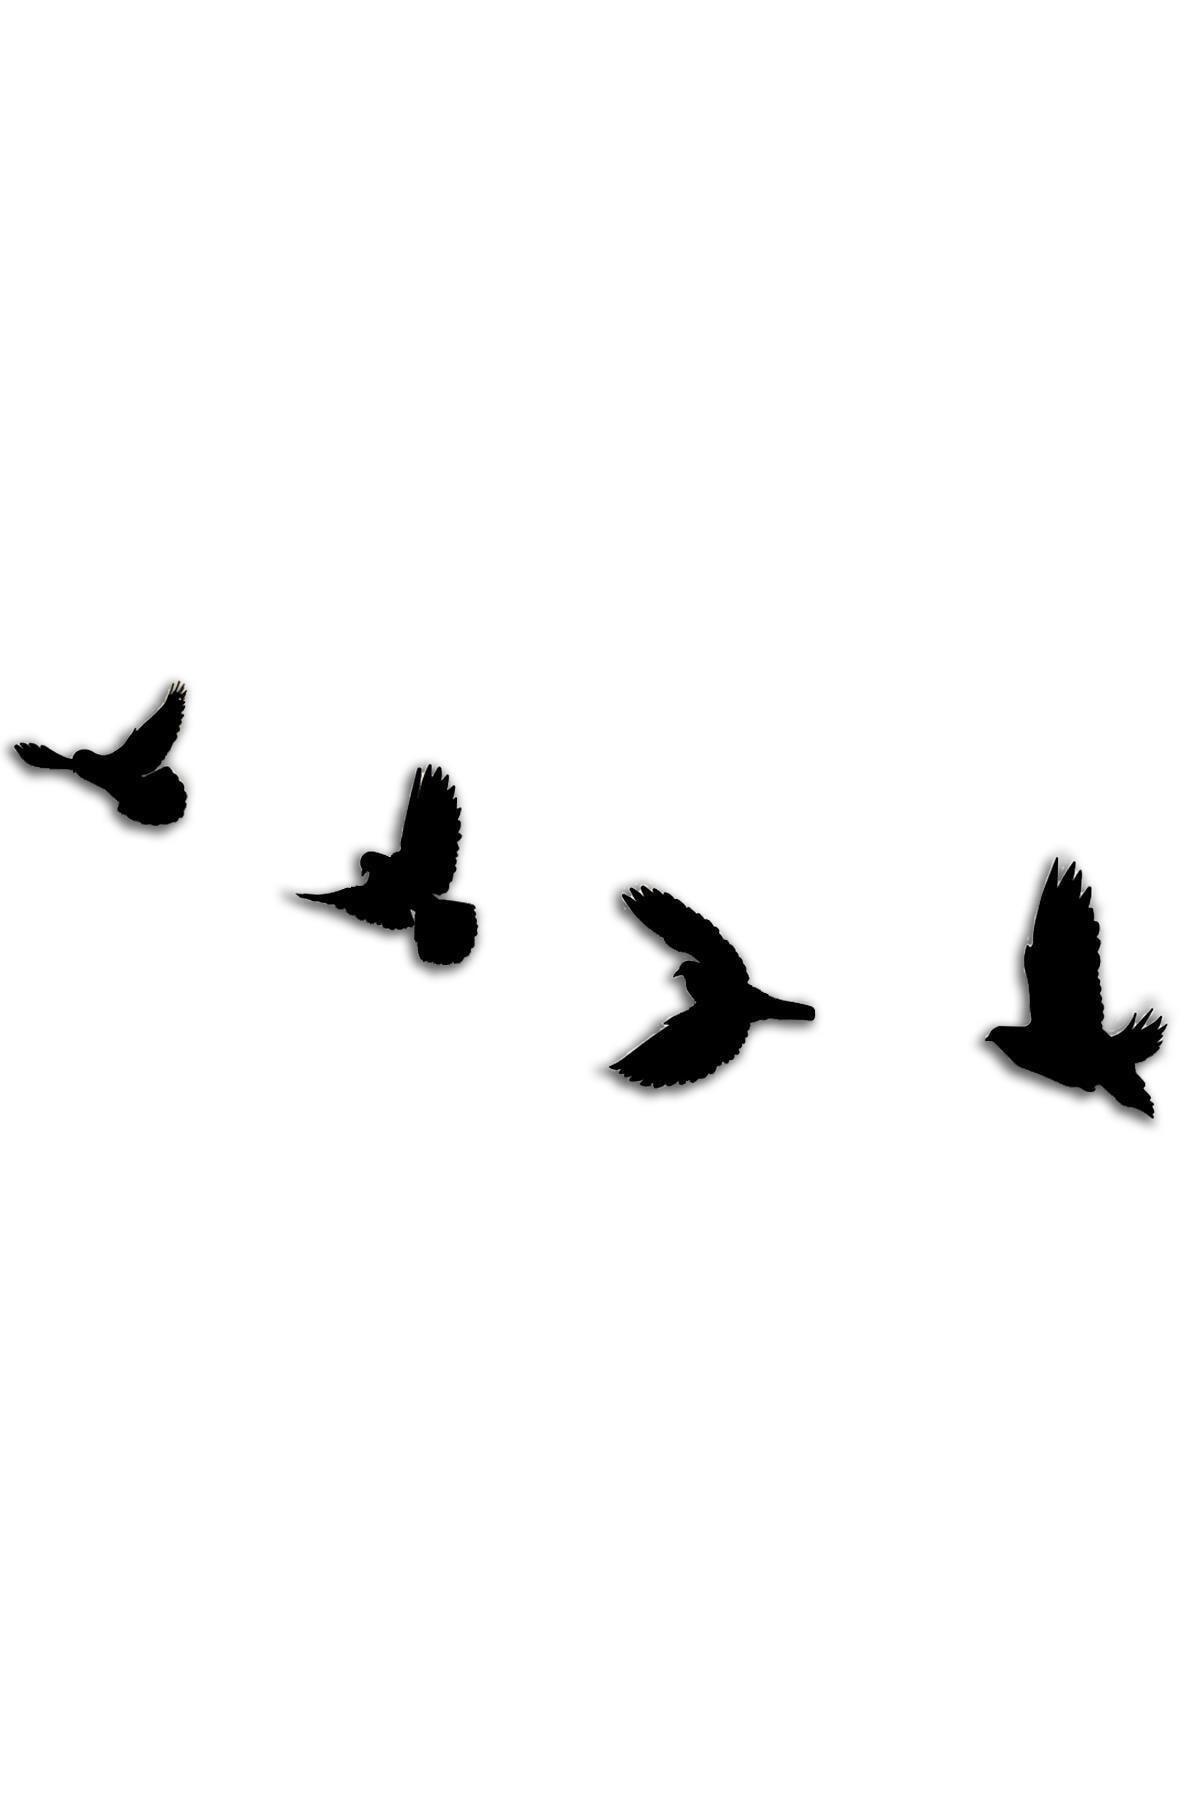 Dekolia Ahşap Dörtlü Kuş Duvar Süsü Lazer Kesim Duvar Dekoru Art1233 2